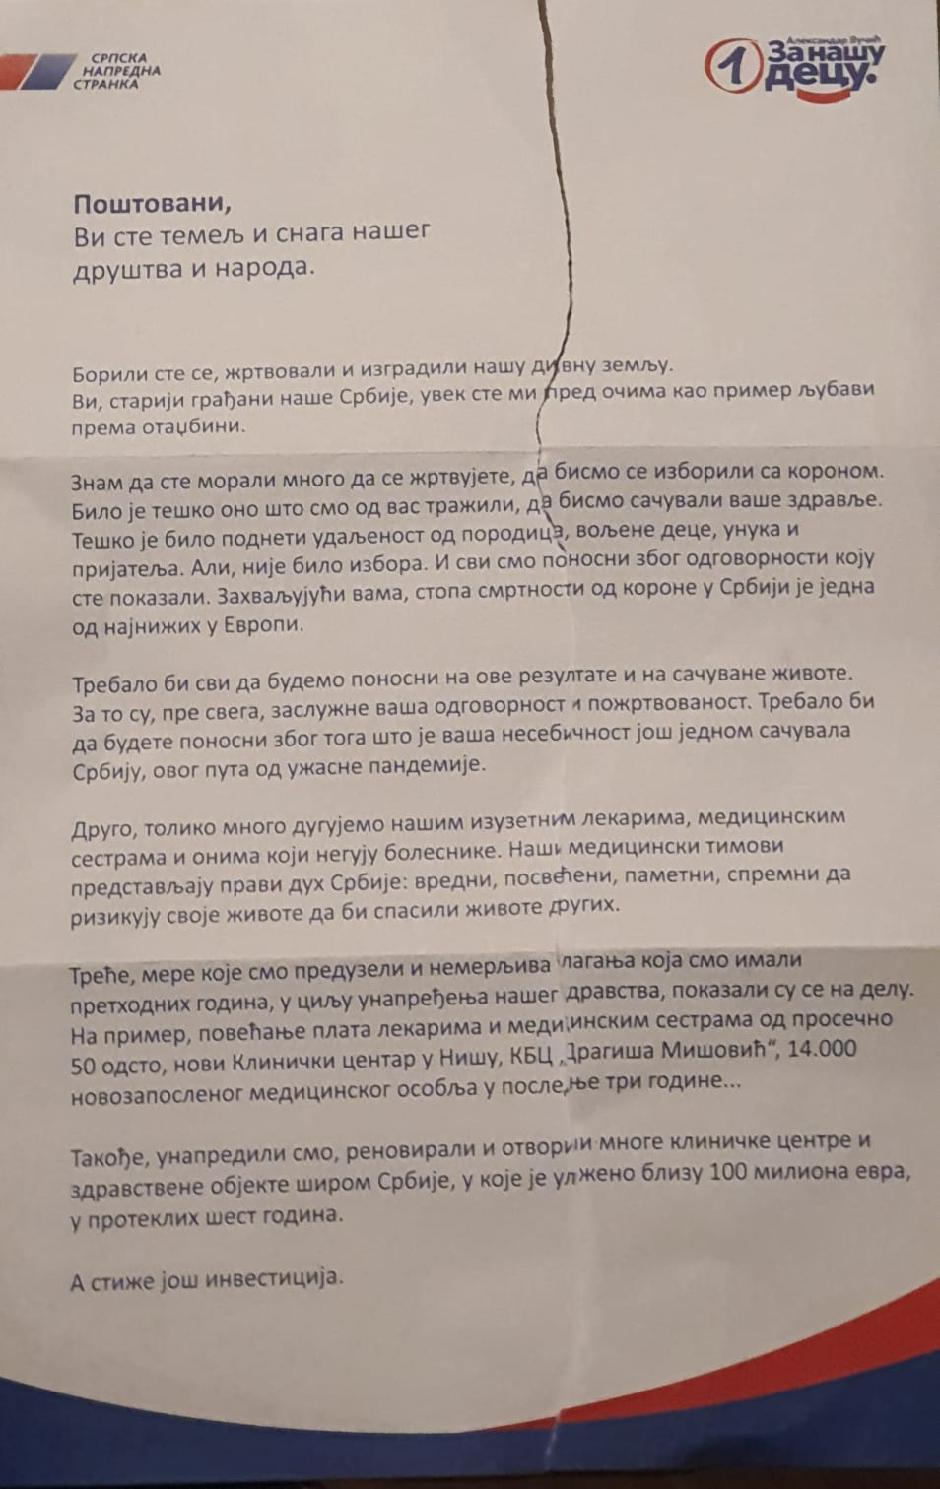 Pismo Aleksandra Vučića penzionerima FOTO: Printscreen